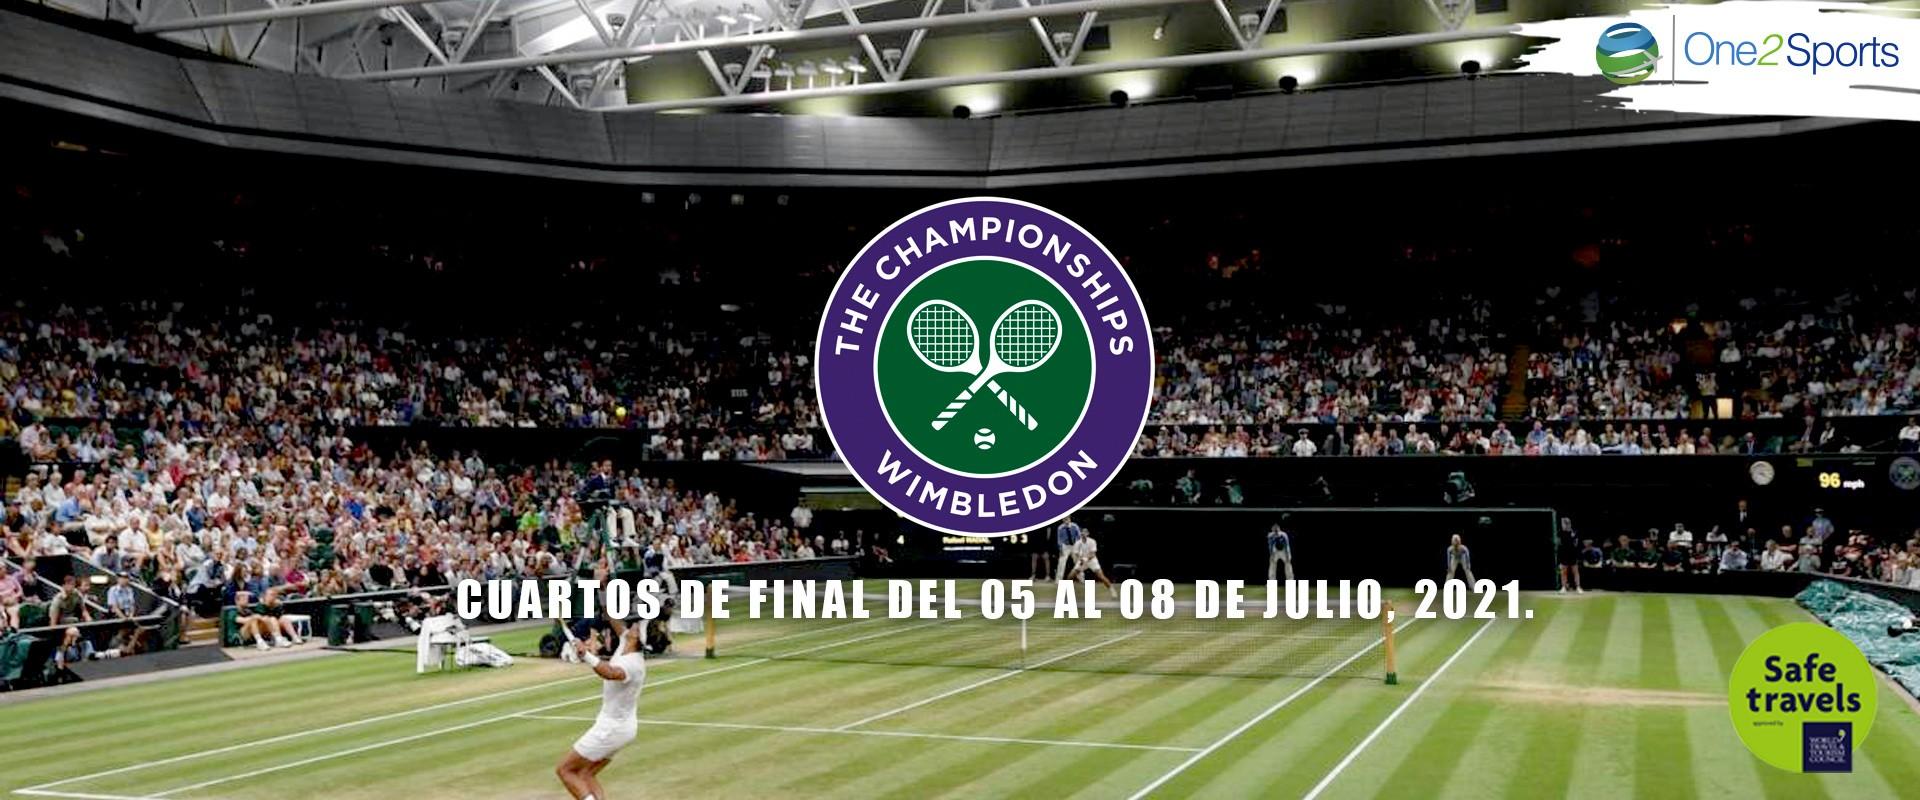 Wimbledon Cuartos de Final